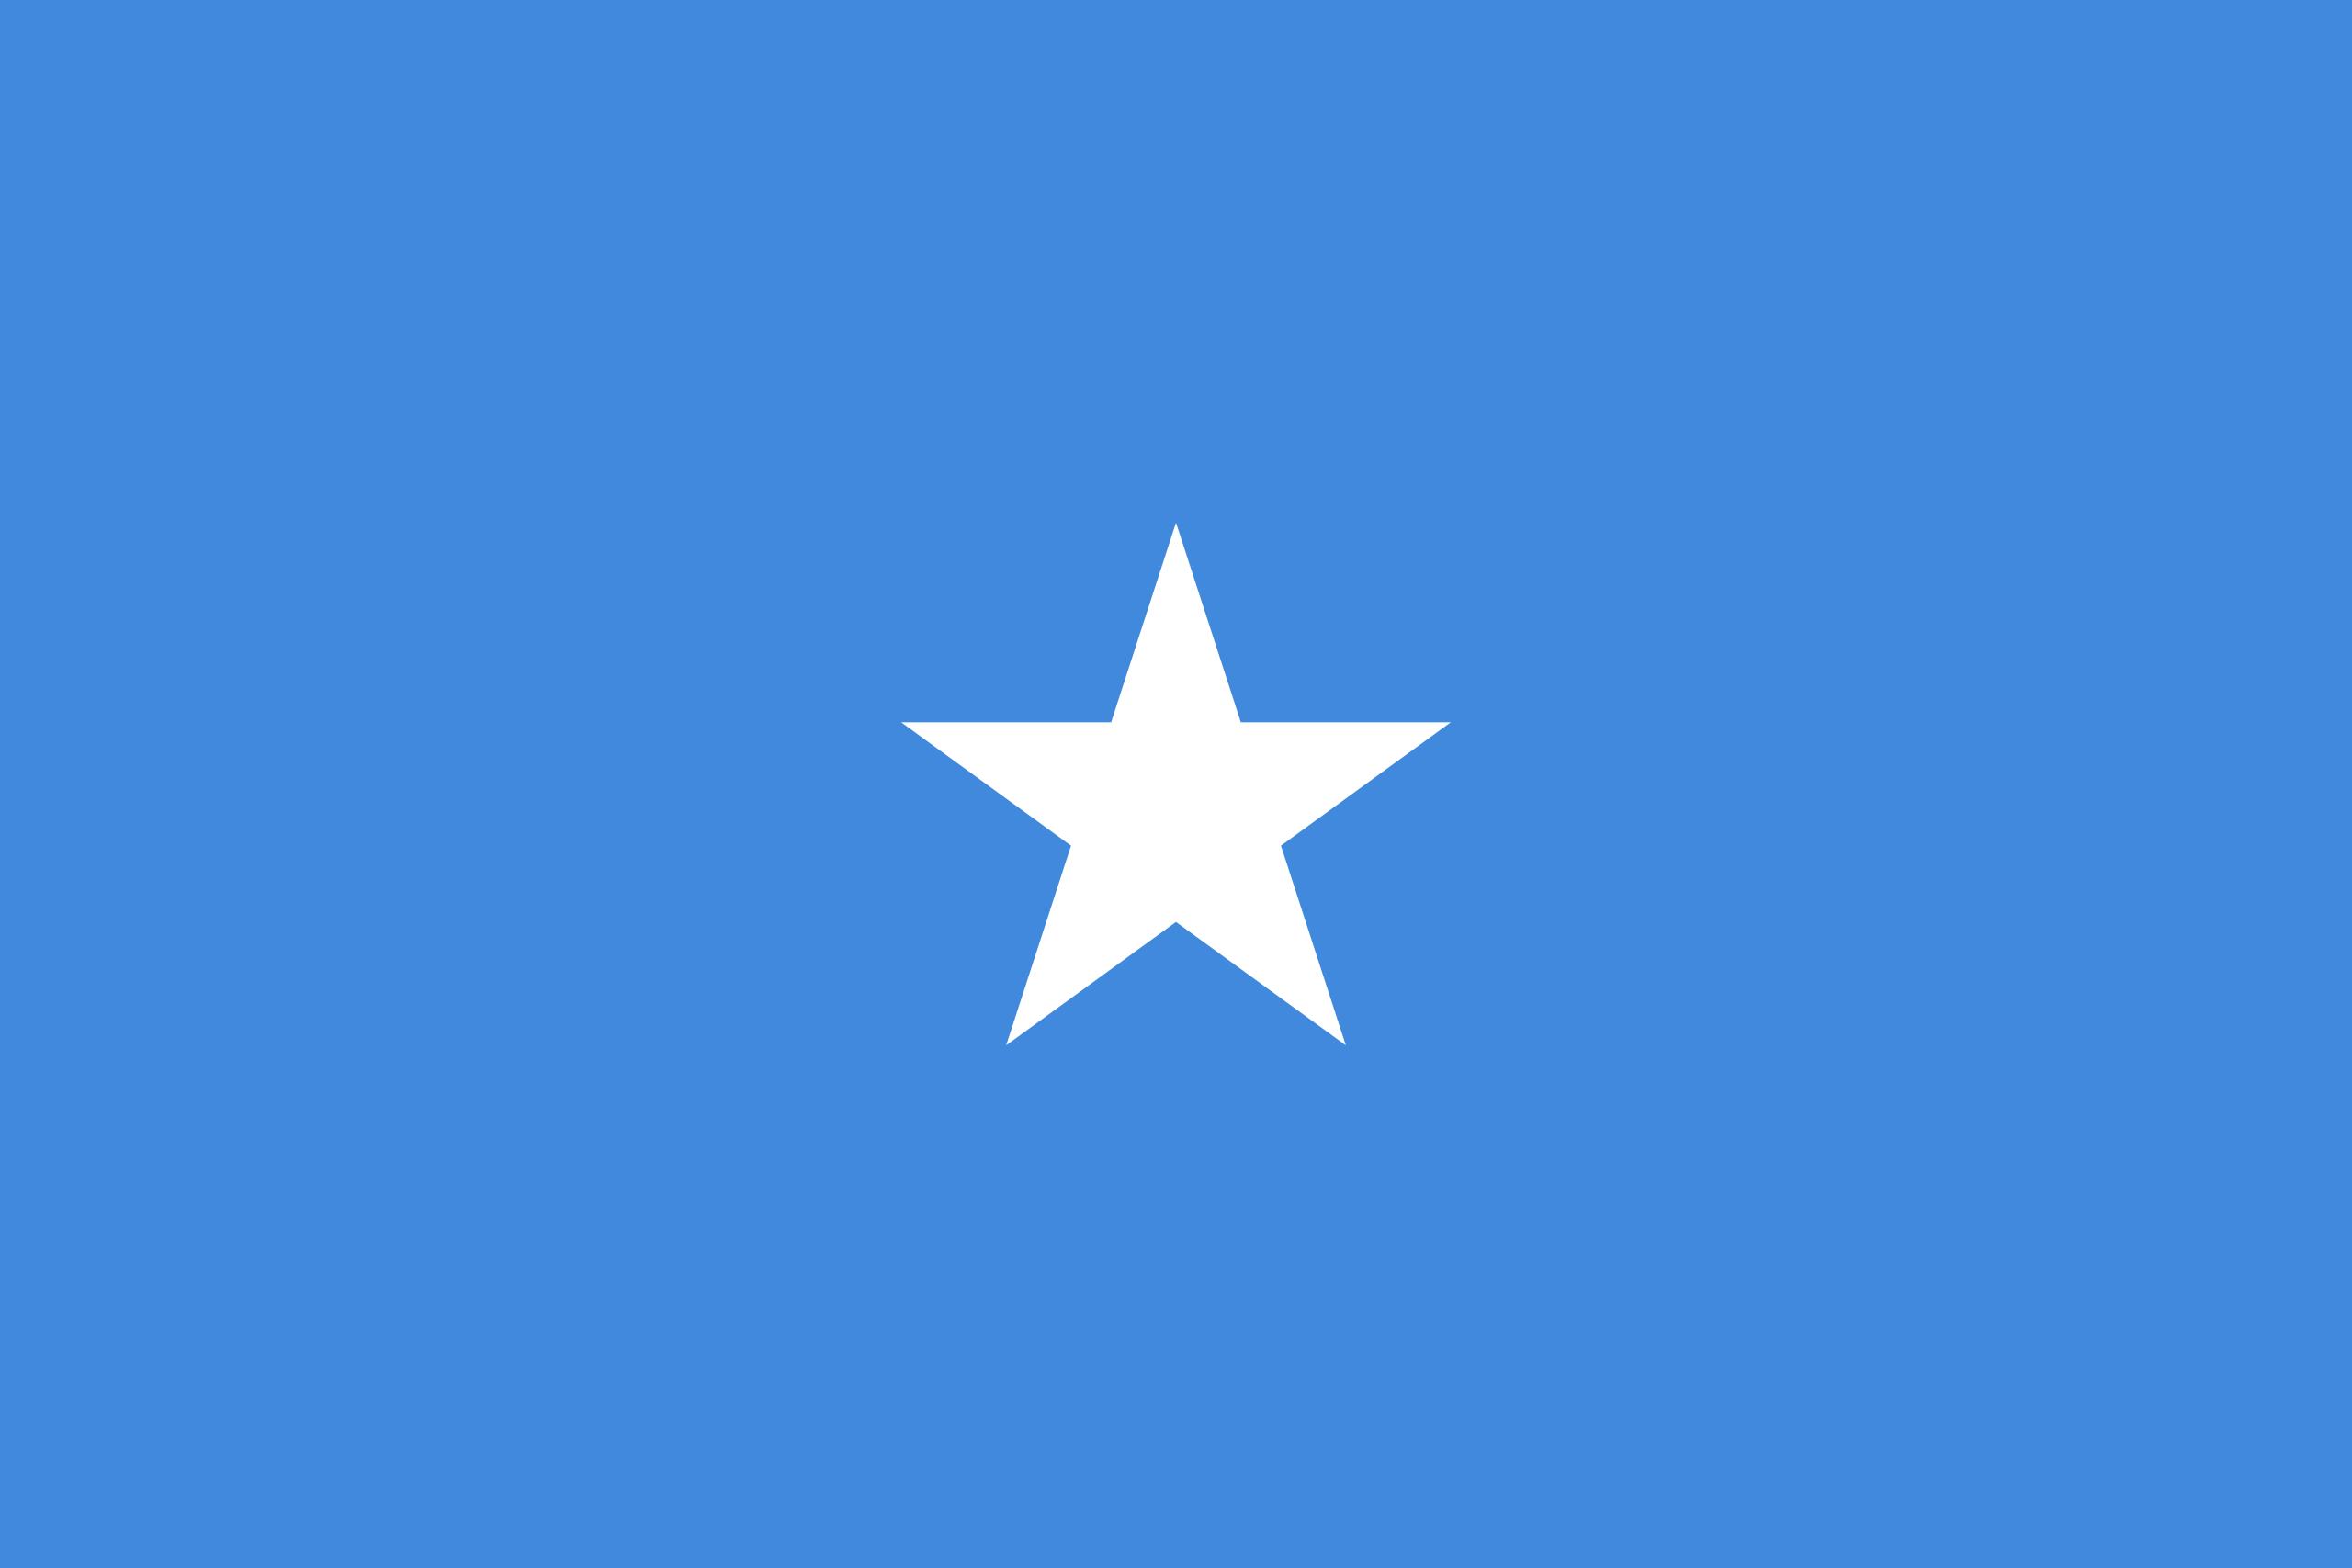 Somalia, paese, emblema, logo, simbolo - Sfondi HD - Professor-falken.com